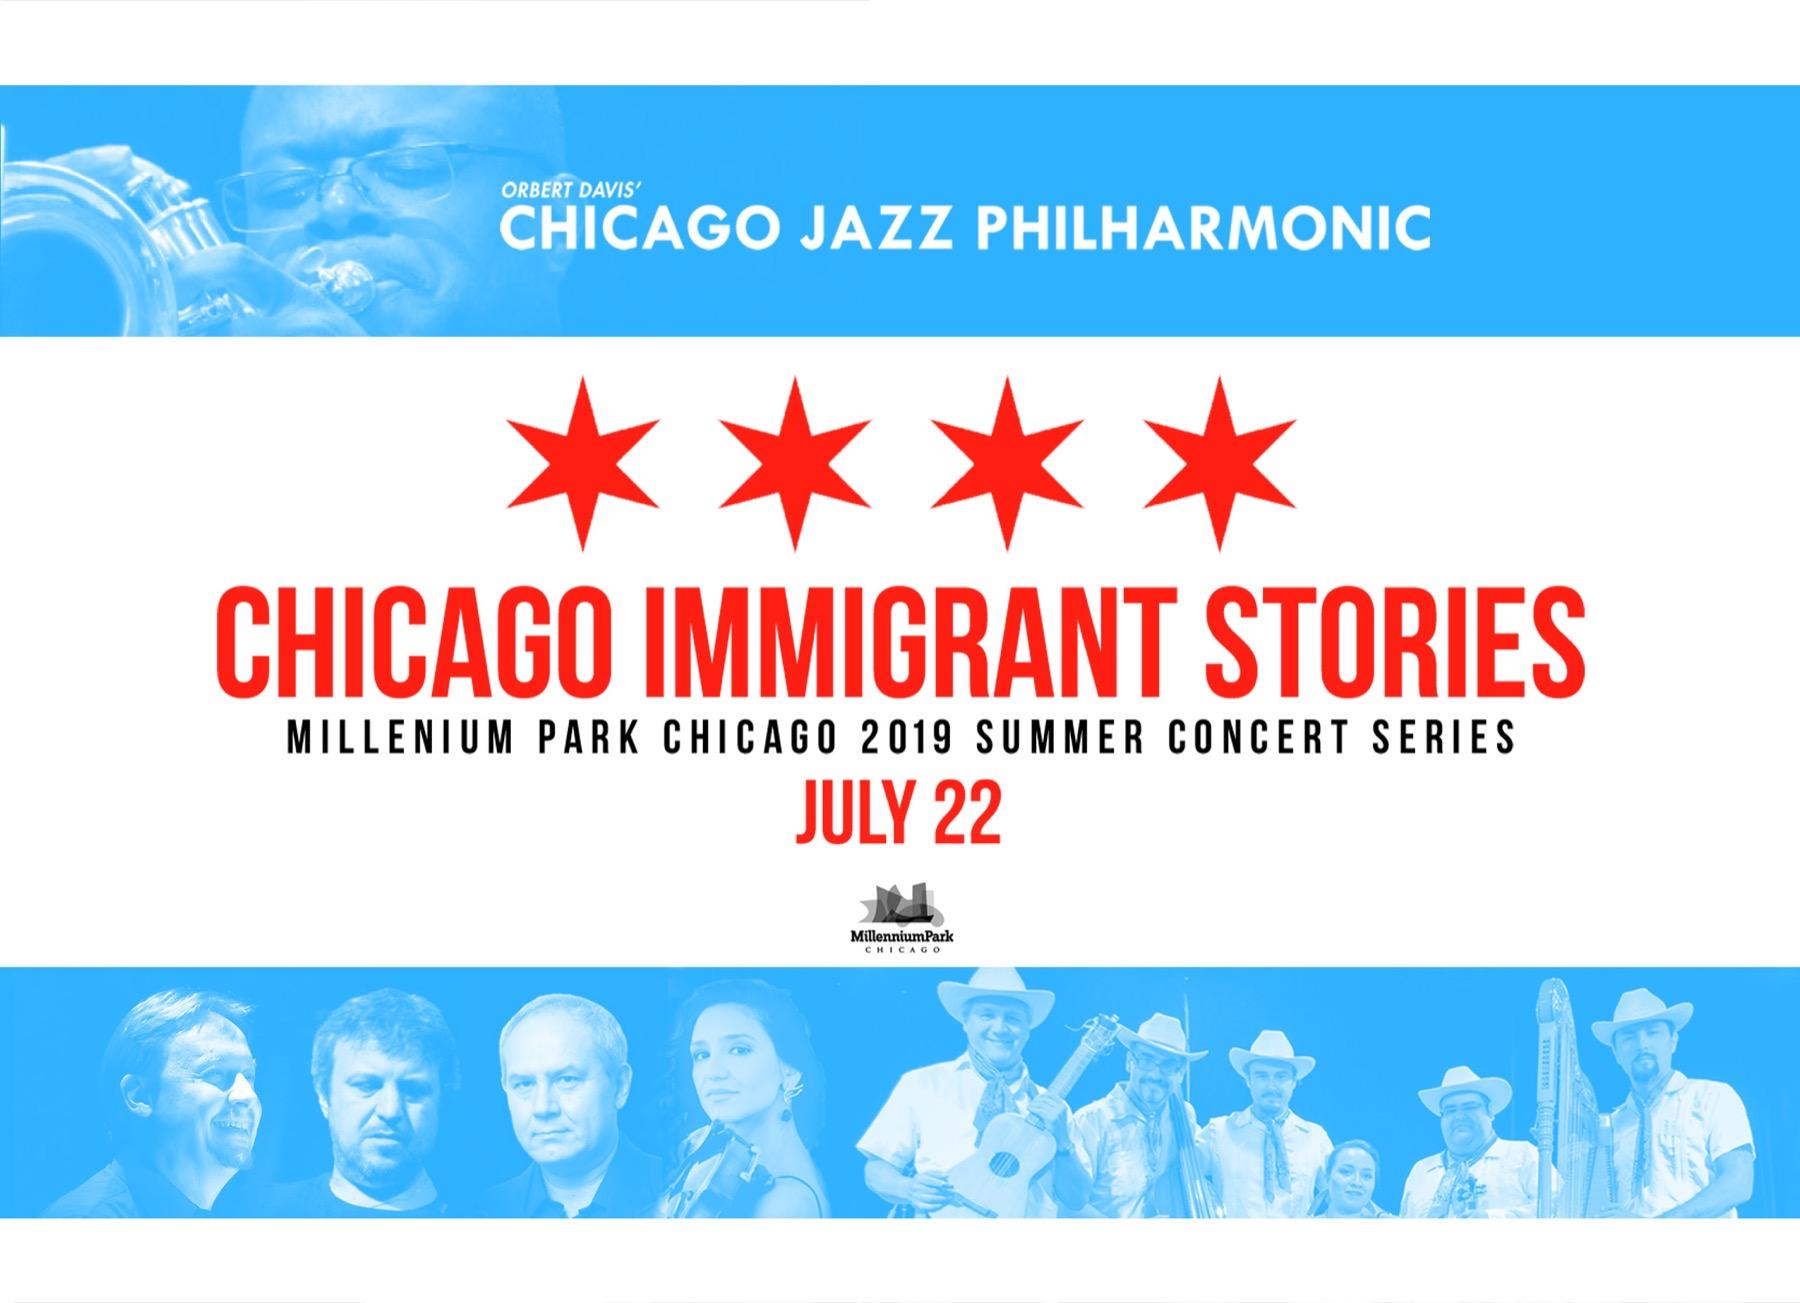 Chicago Jazz Philharmonic's Chicago Immigrant Stories II